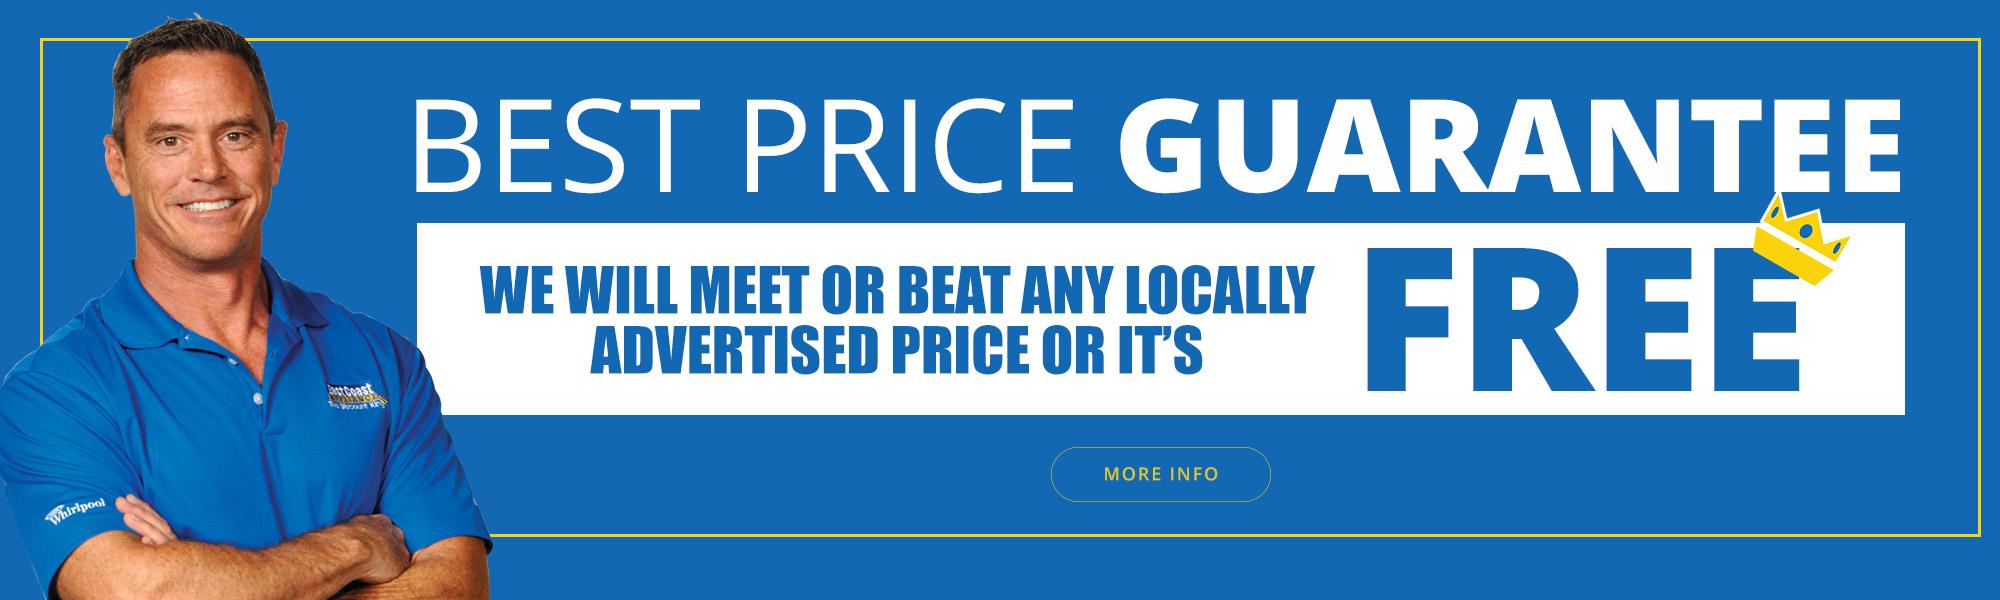 Ec Main Price Lrg